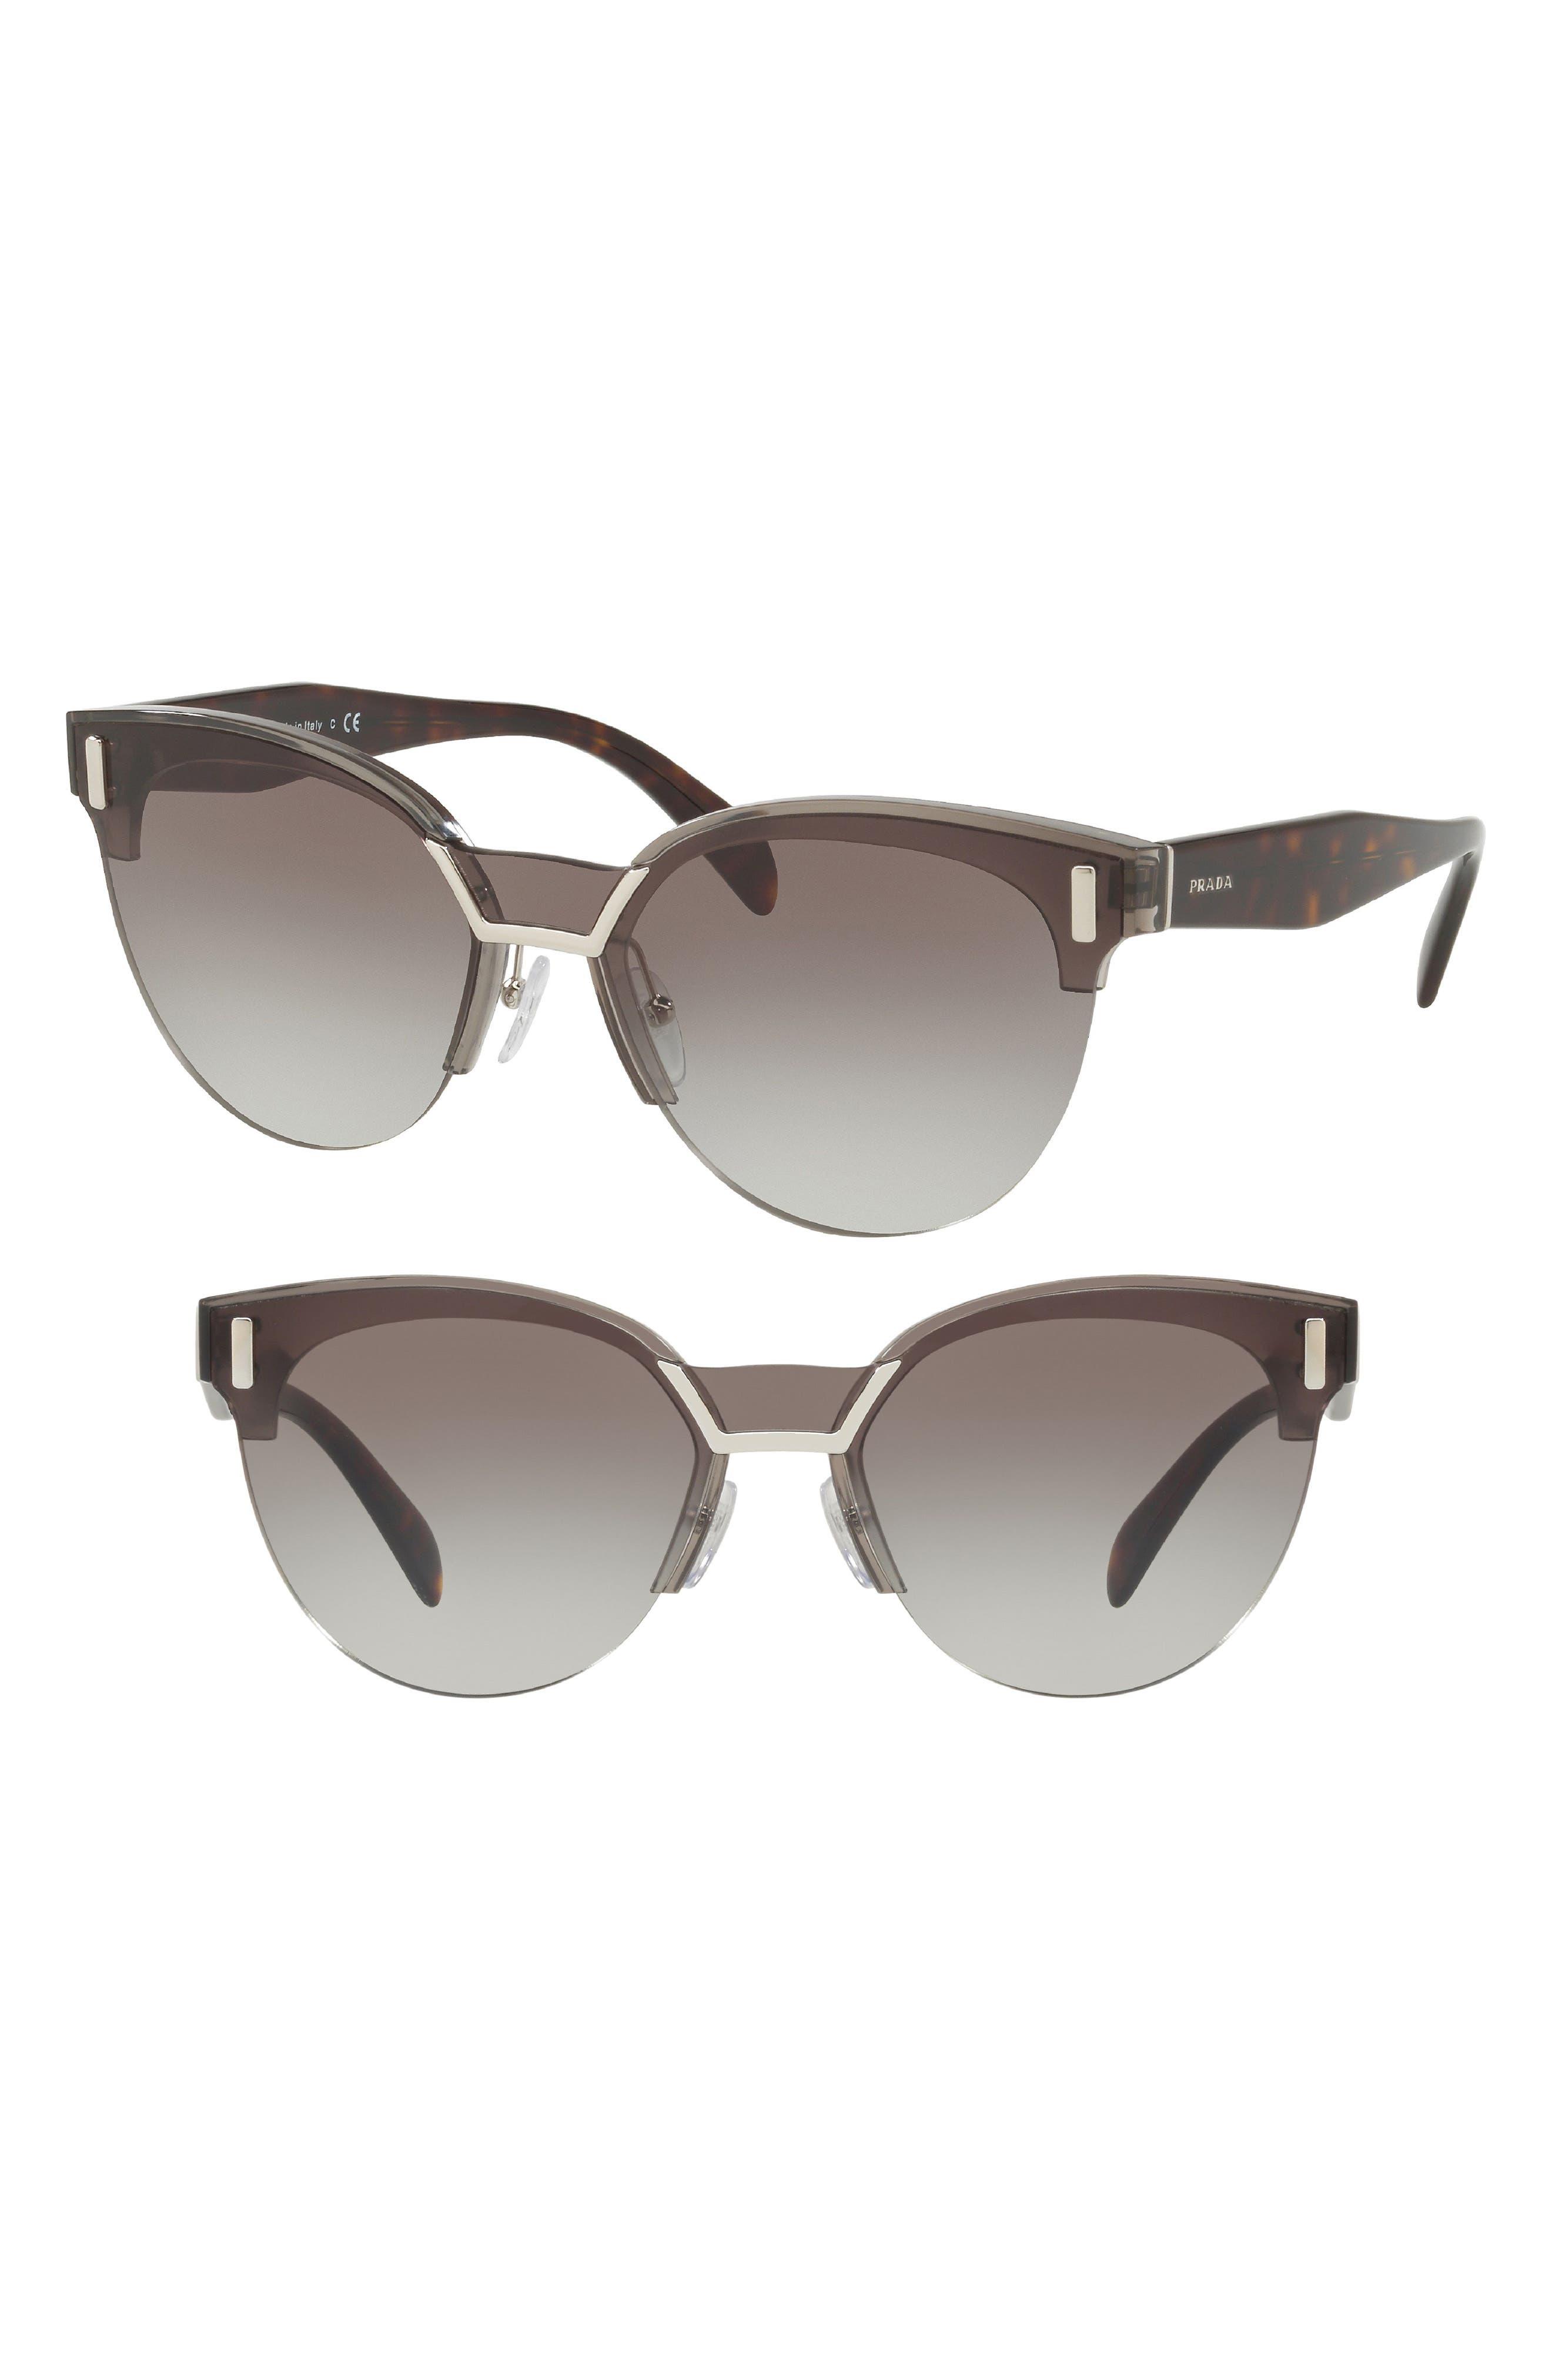 50mm Semi Rimless Gradient Sunglasses,                             Alternate thumbnail 2, color,